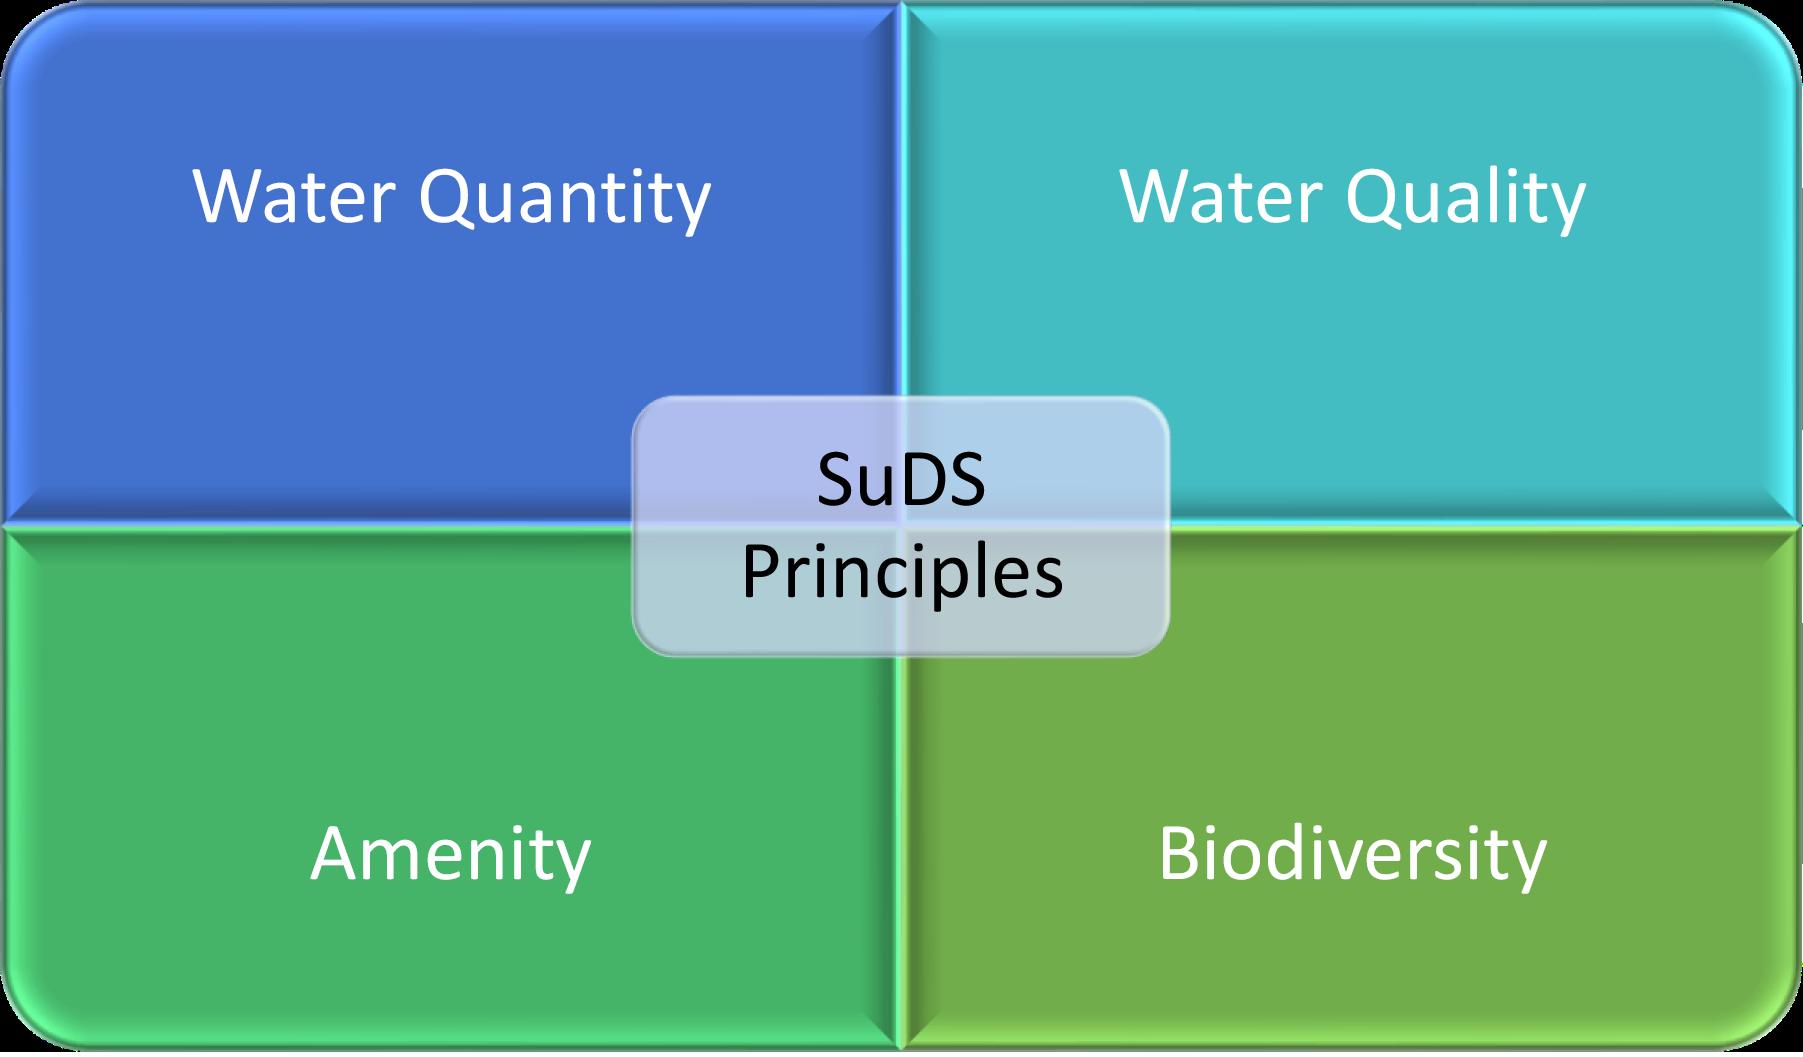 SuDS Principles